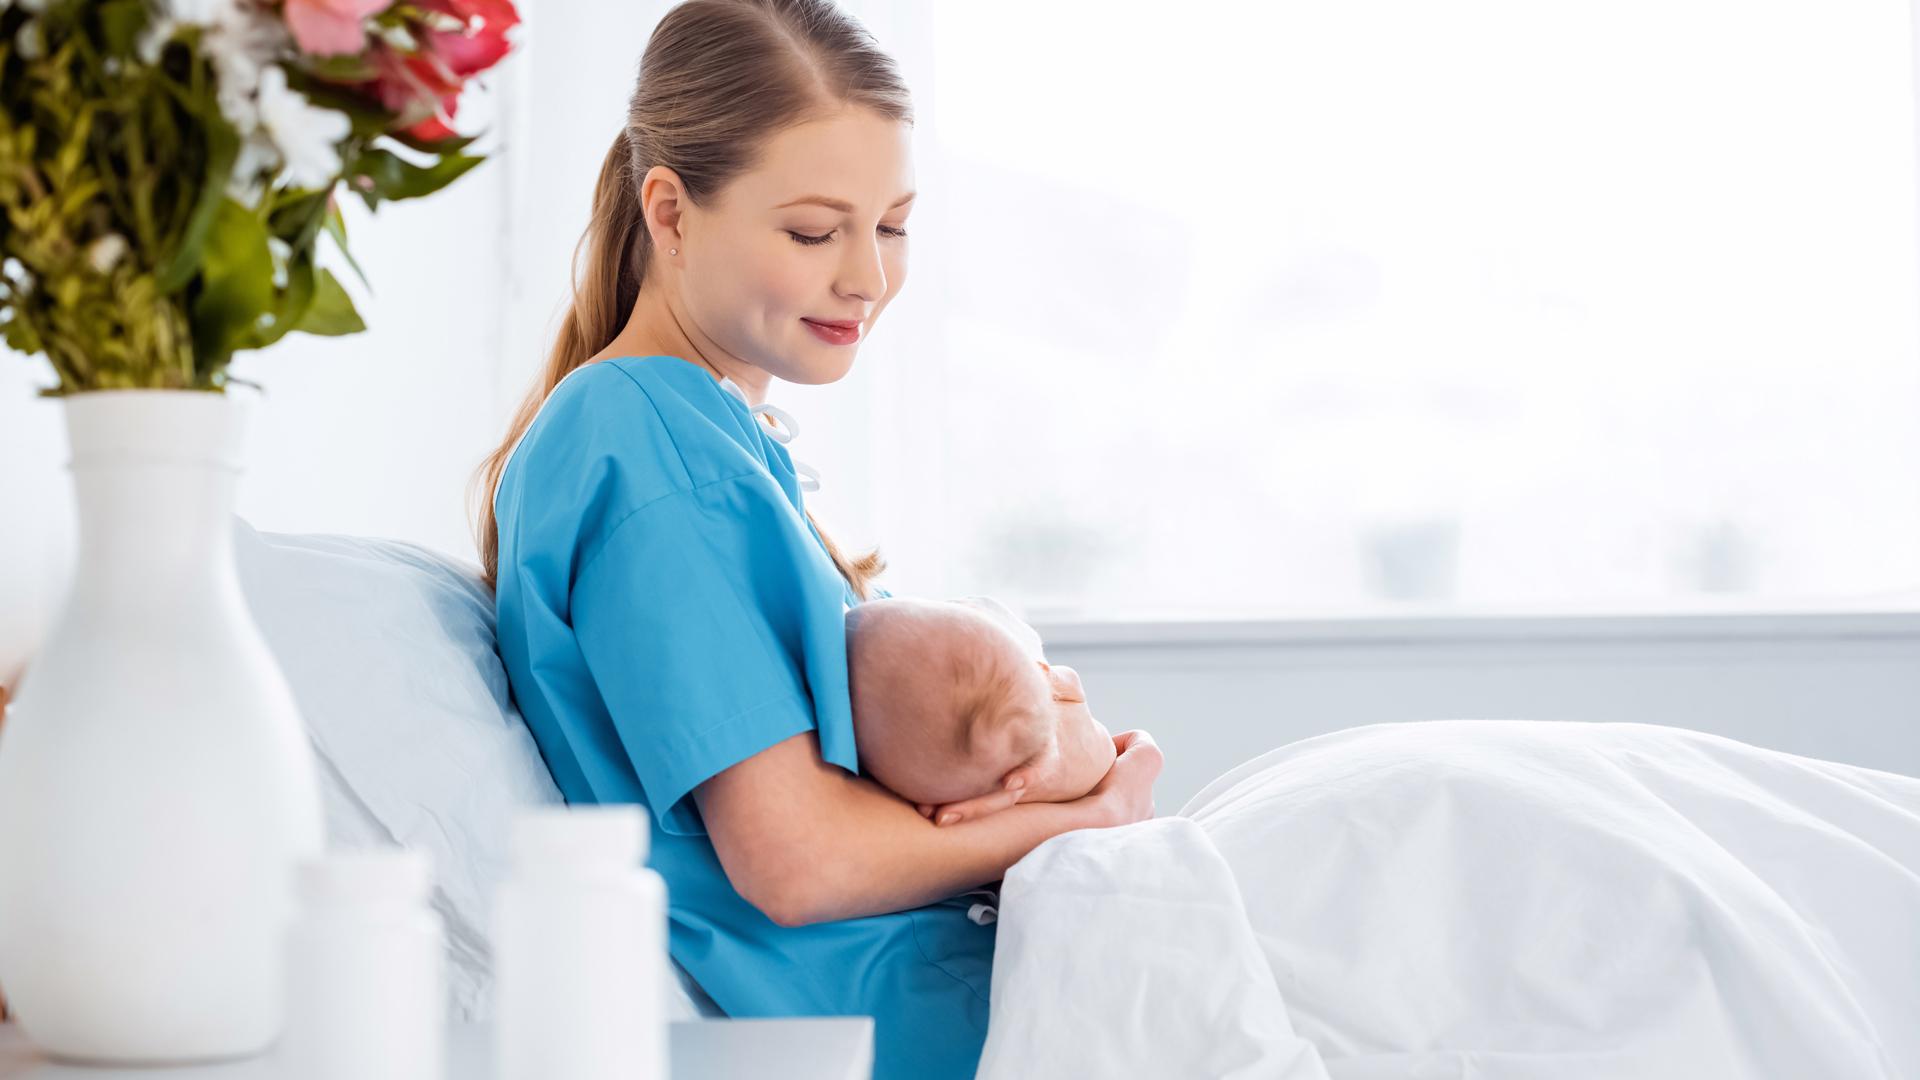 Сила мышц тазового дна у женщин после родов и влияние на нее консервативных методов лечения